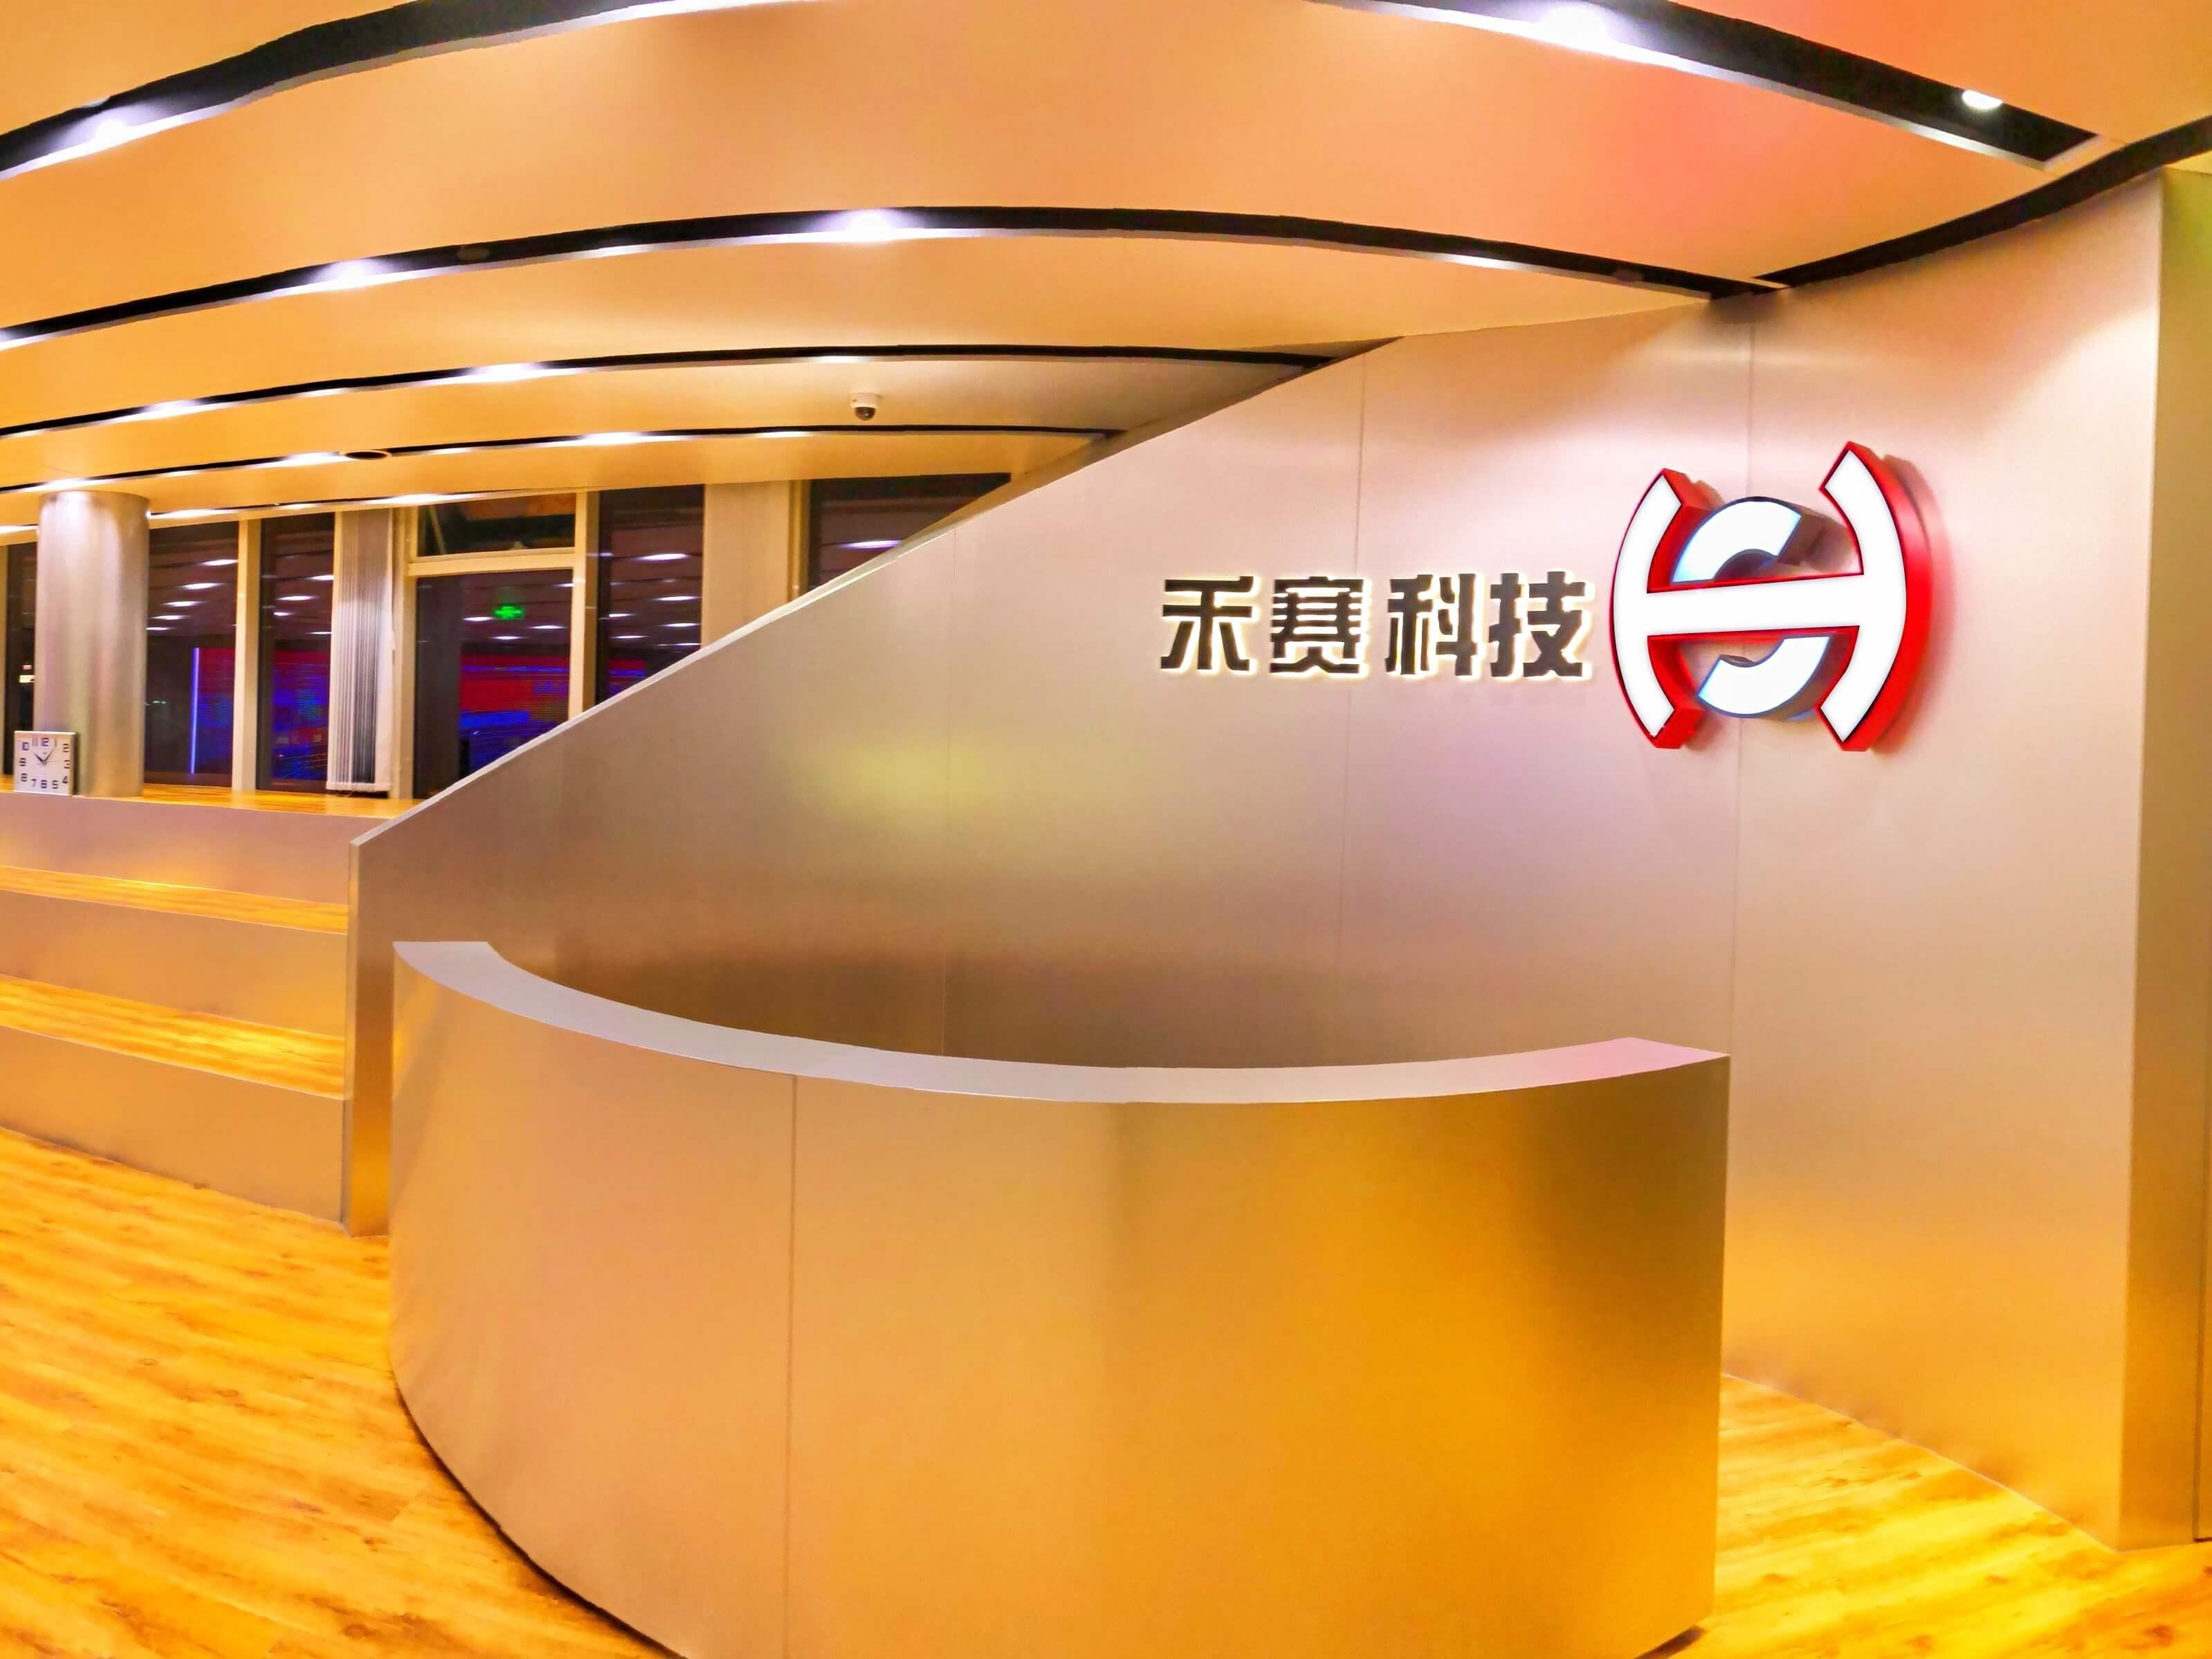 Chinese Lidar Maker Hesai Raises Record-high USD 173 Million